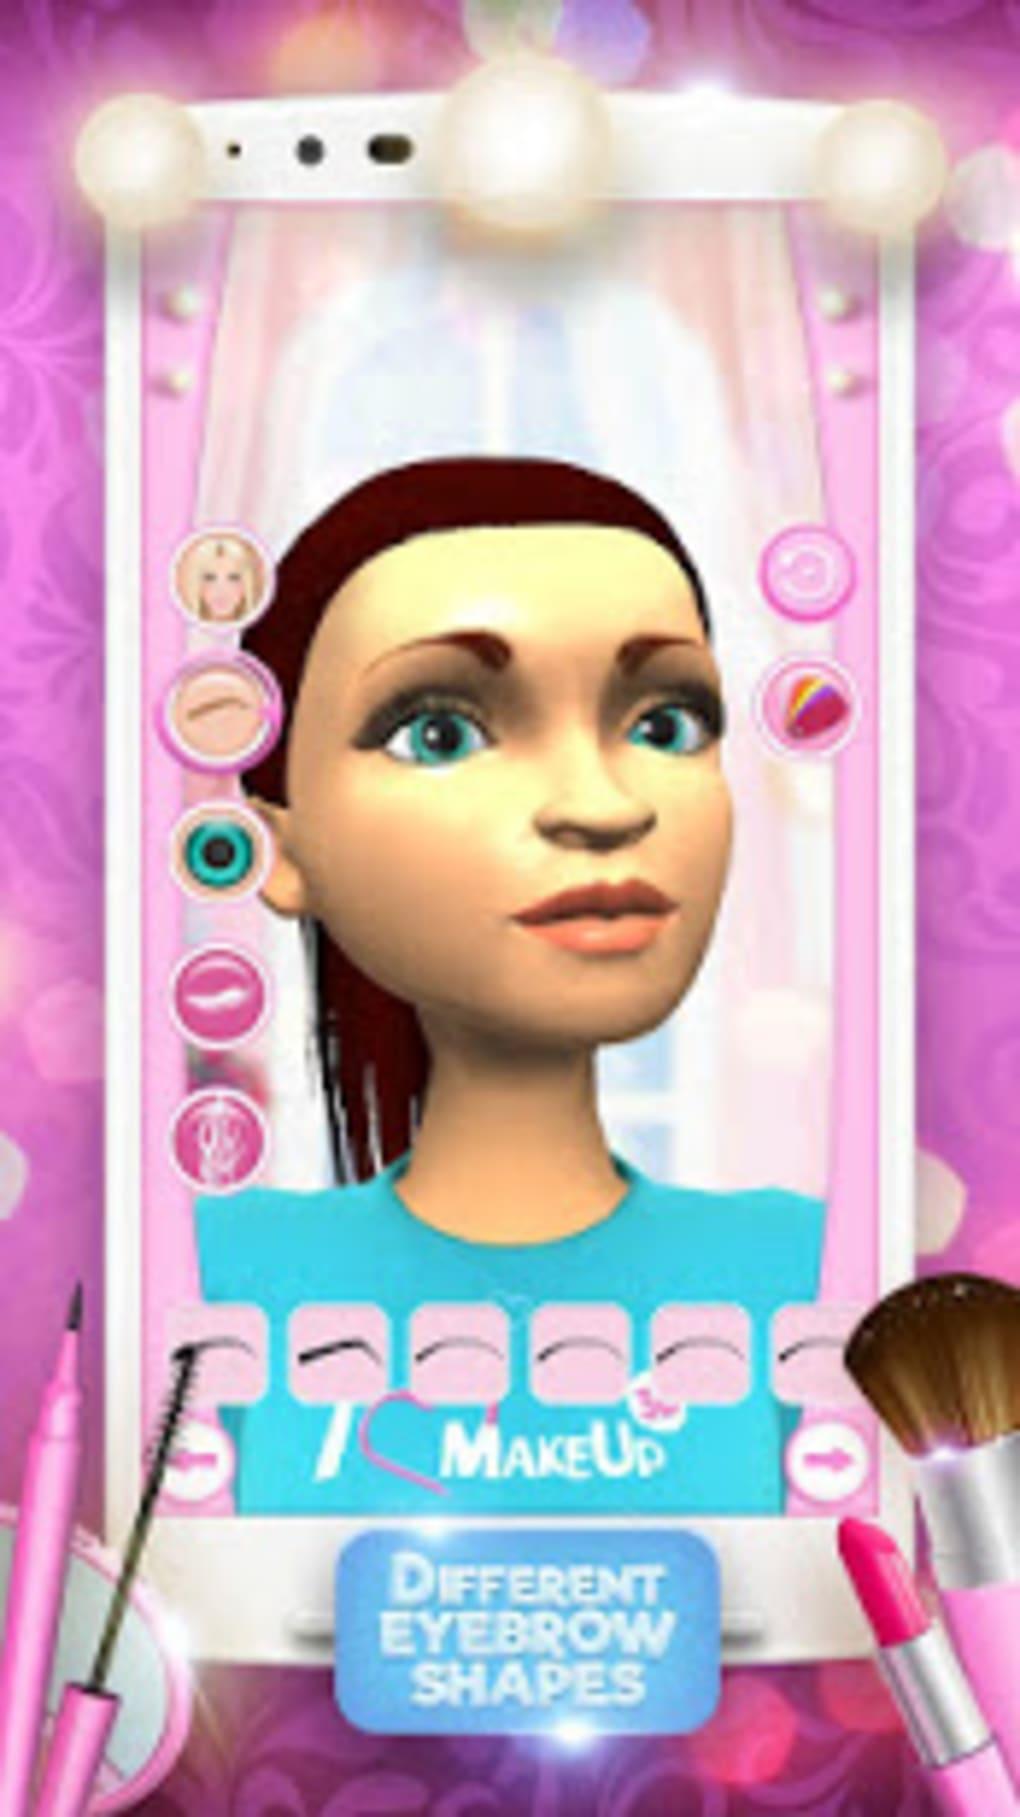 ... 3D Makeup Games For Girls